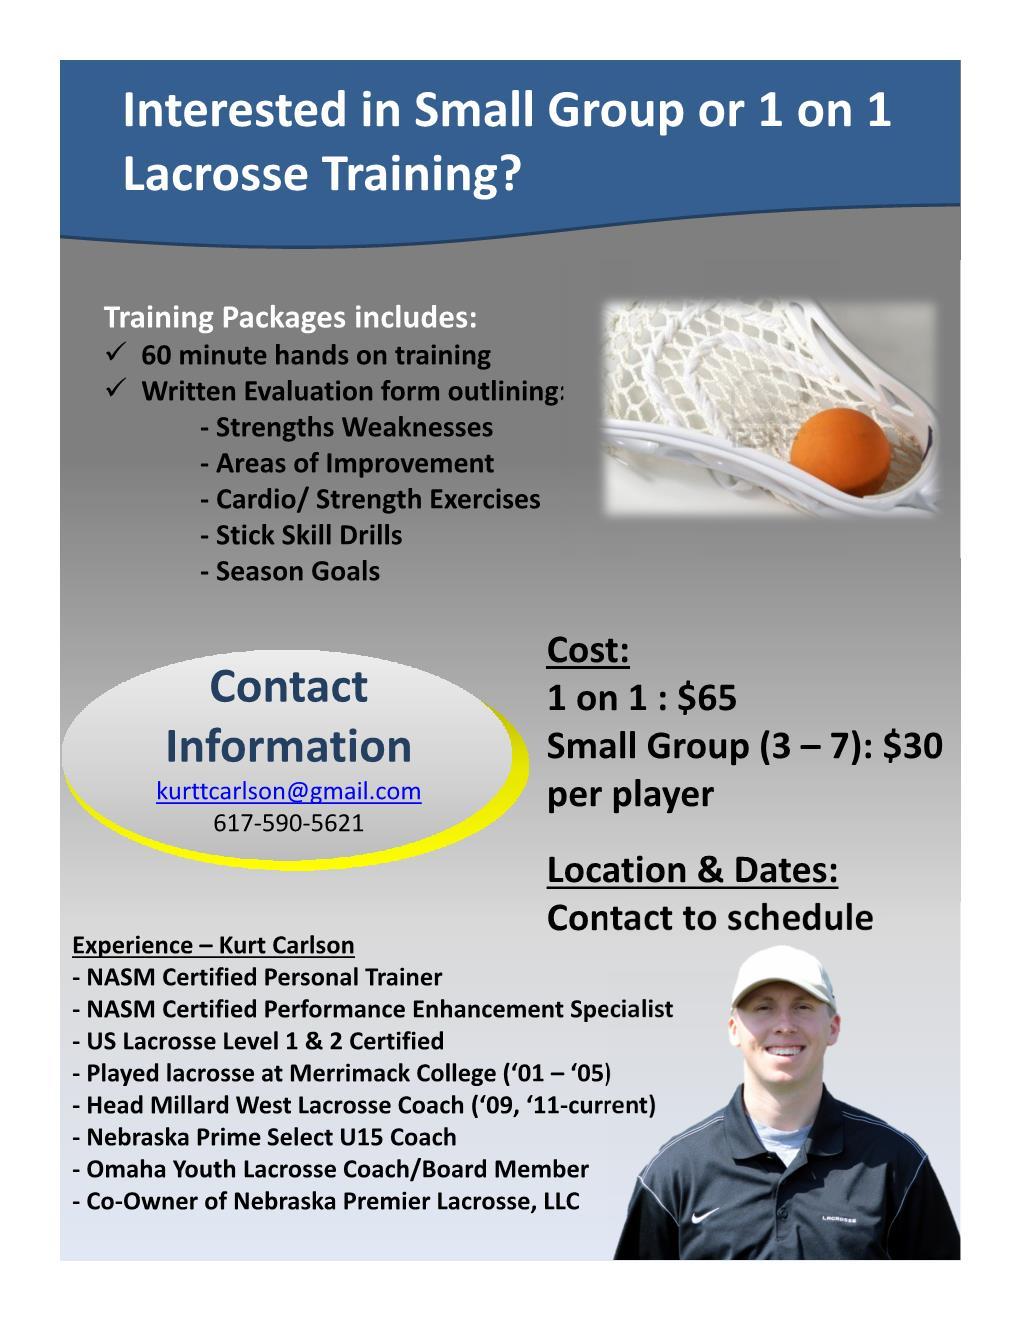 kurt s private training omaha lacrosse club